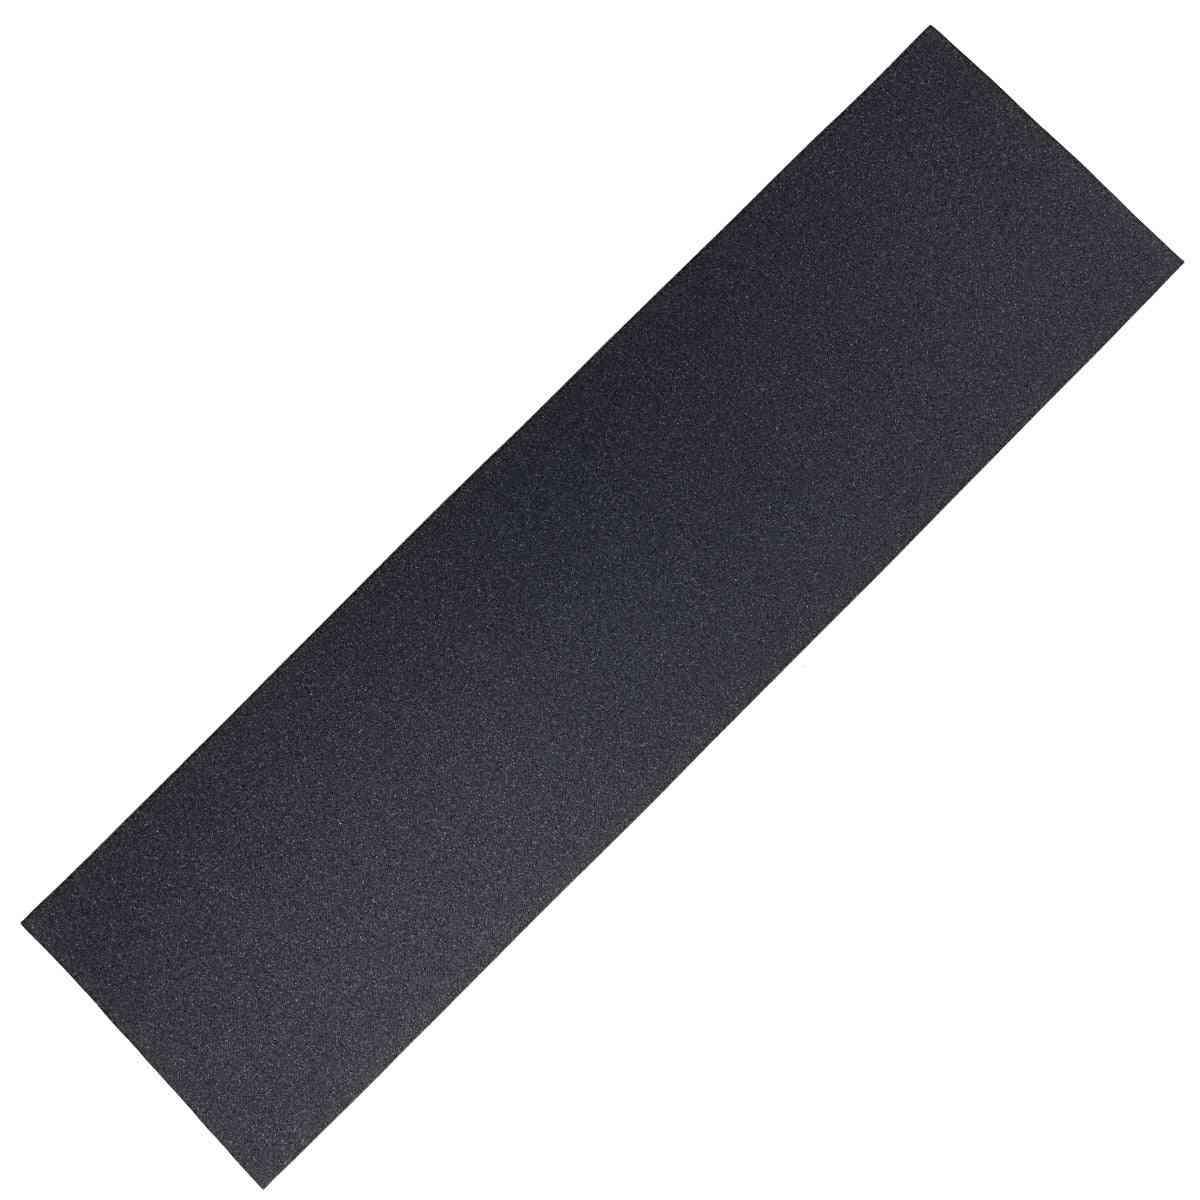 Professional Non-slip Skateboard Sandpaper